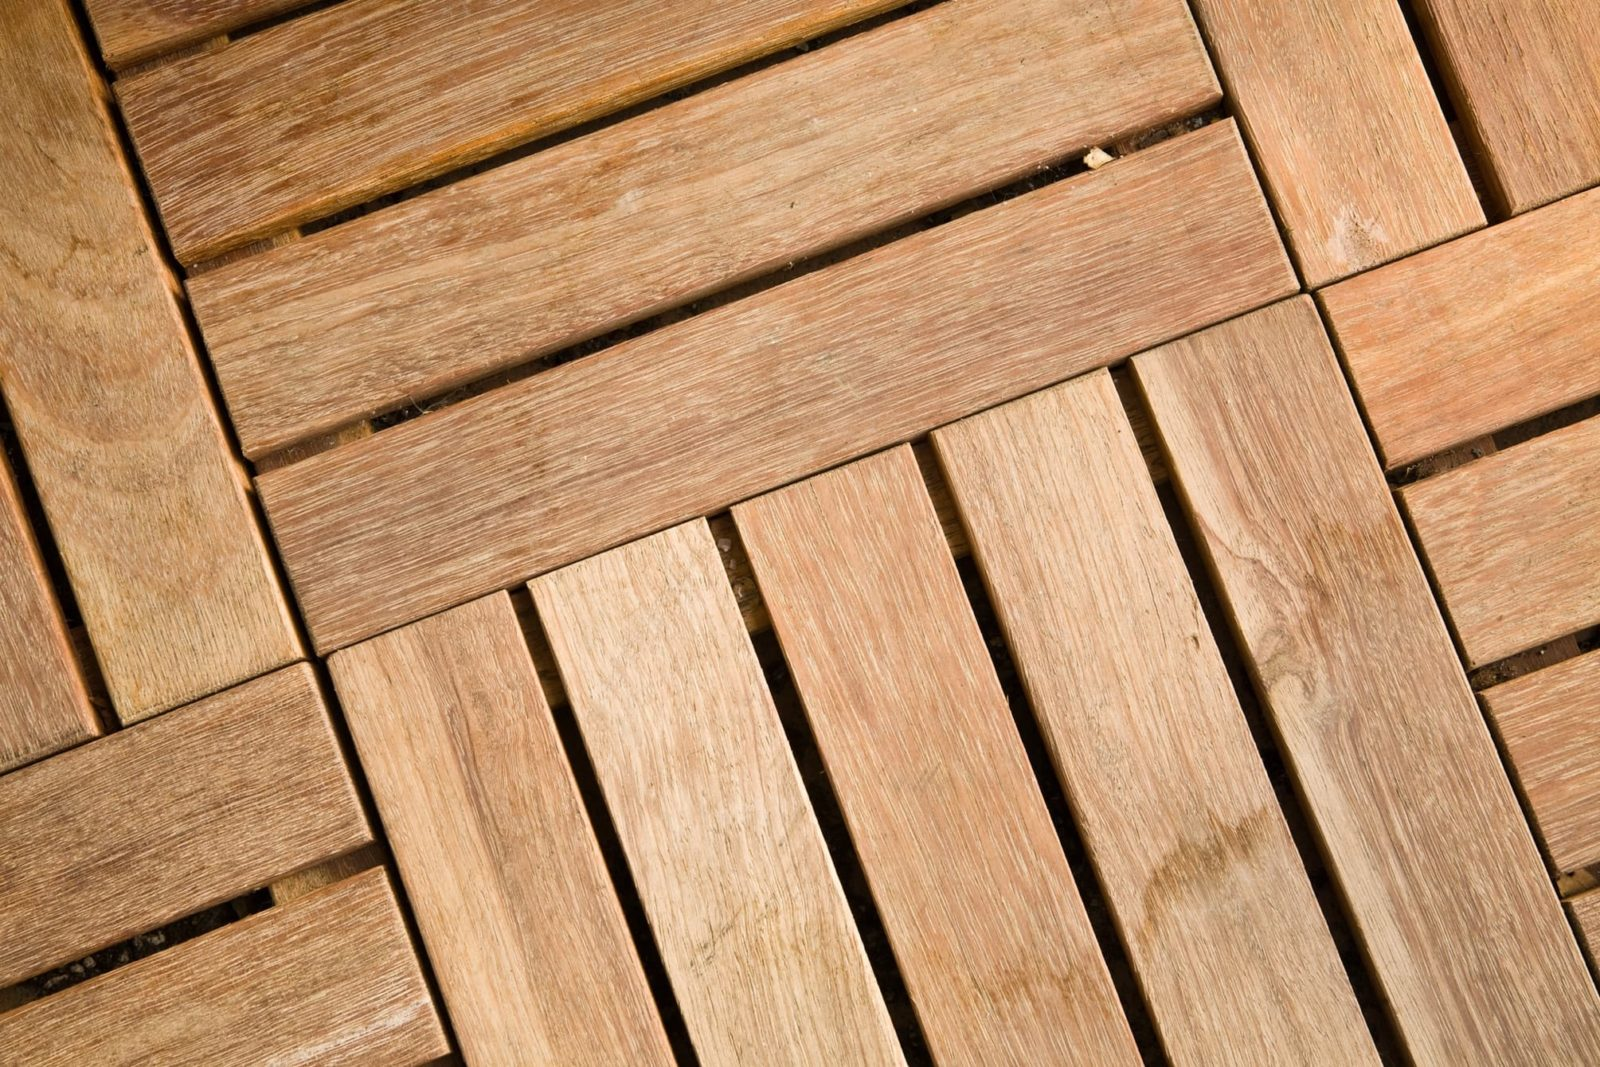 interlocking decking tiles in wooden slats